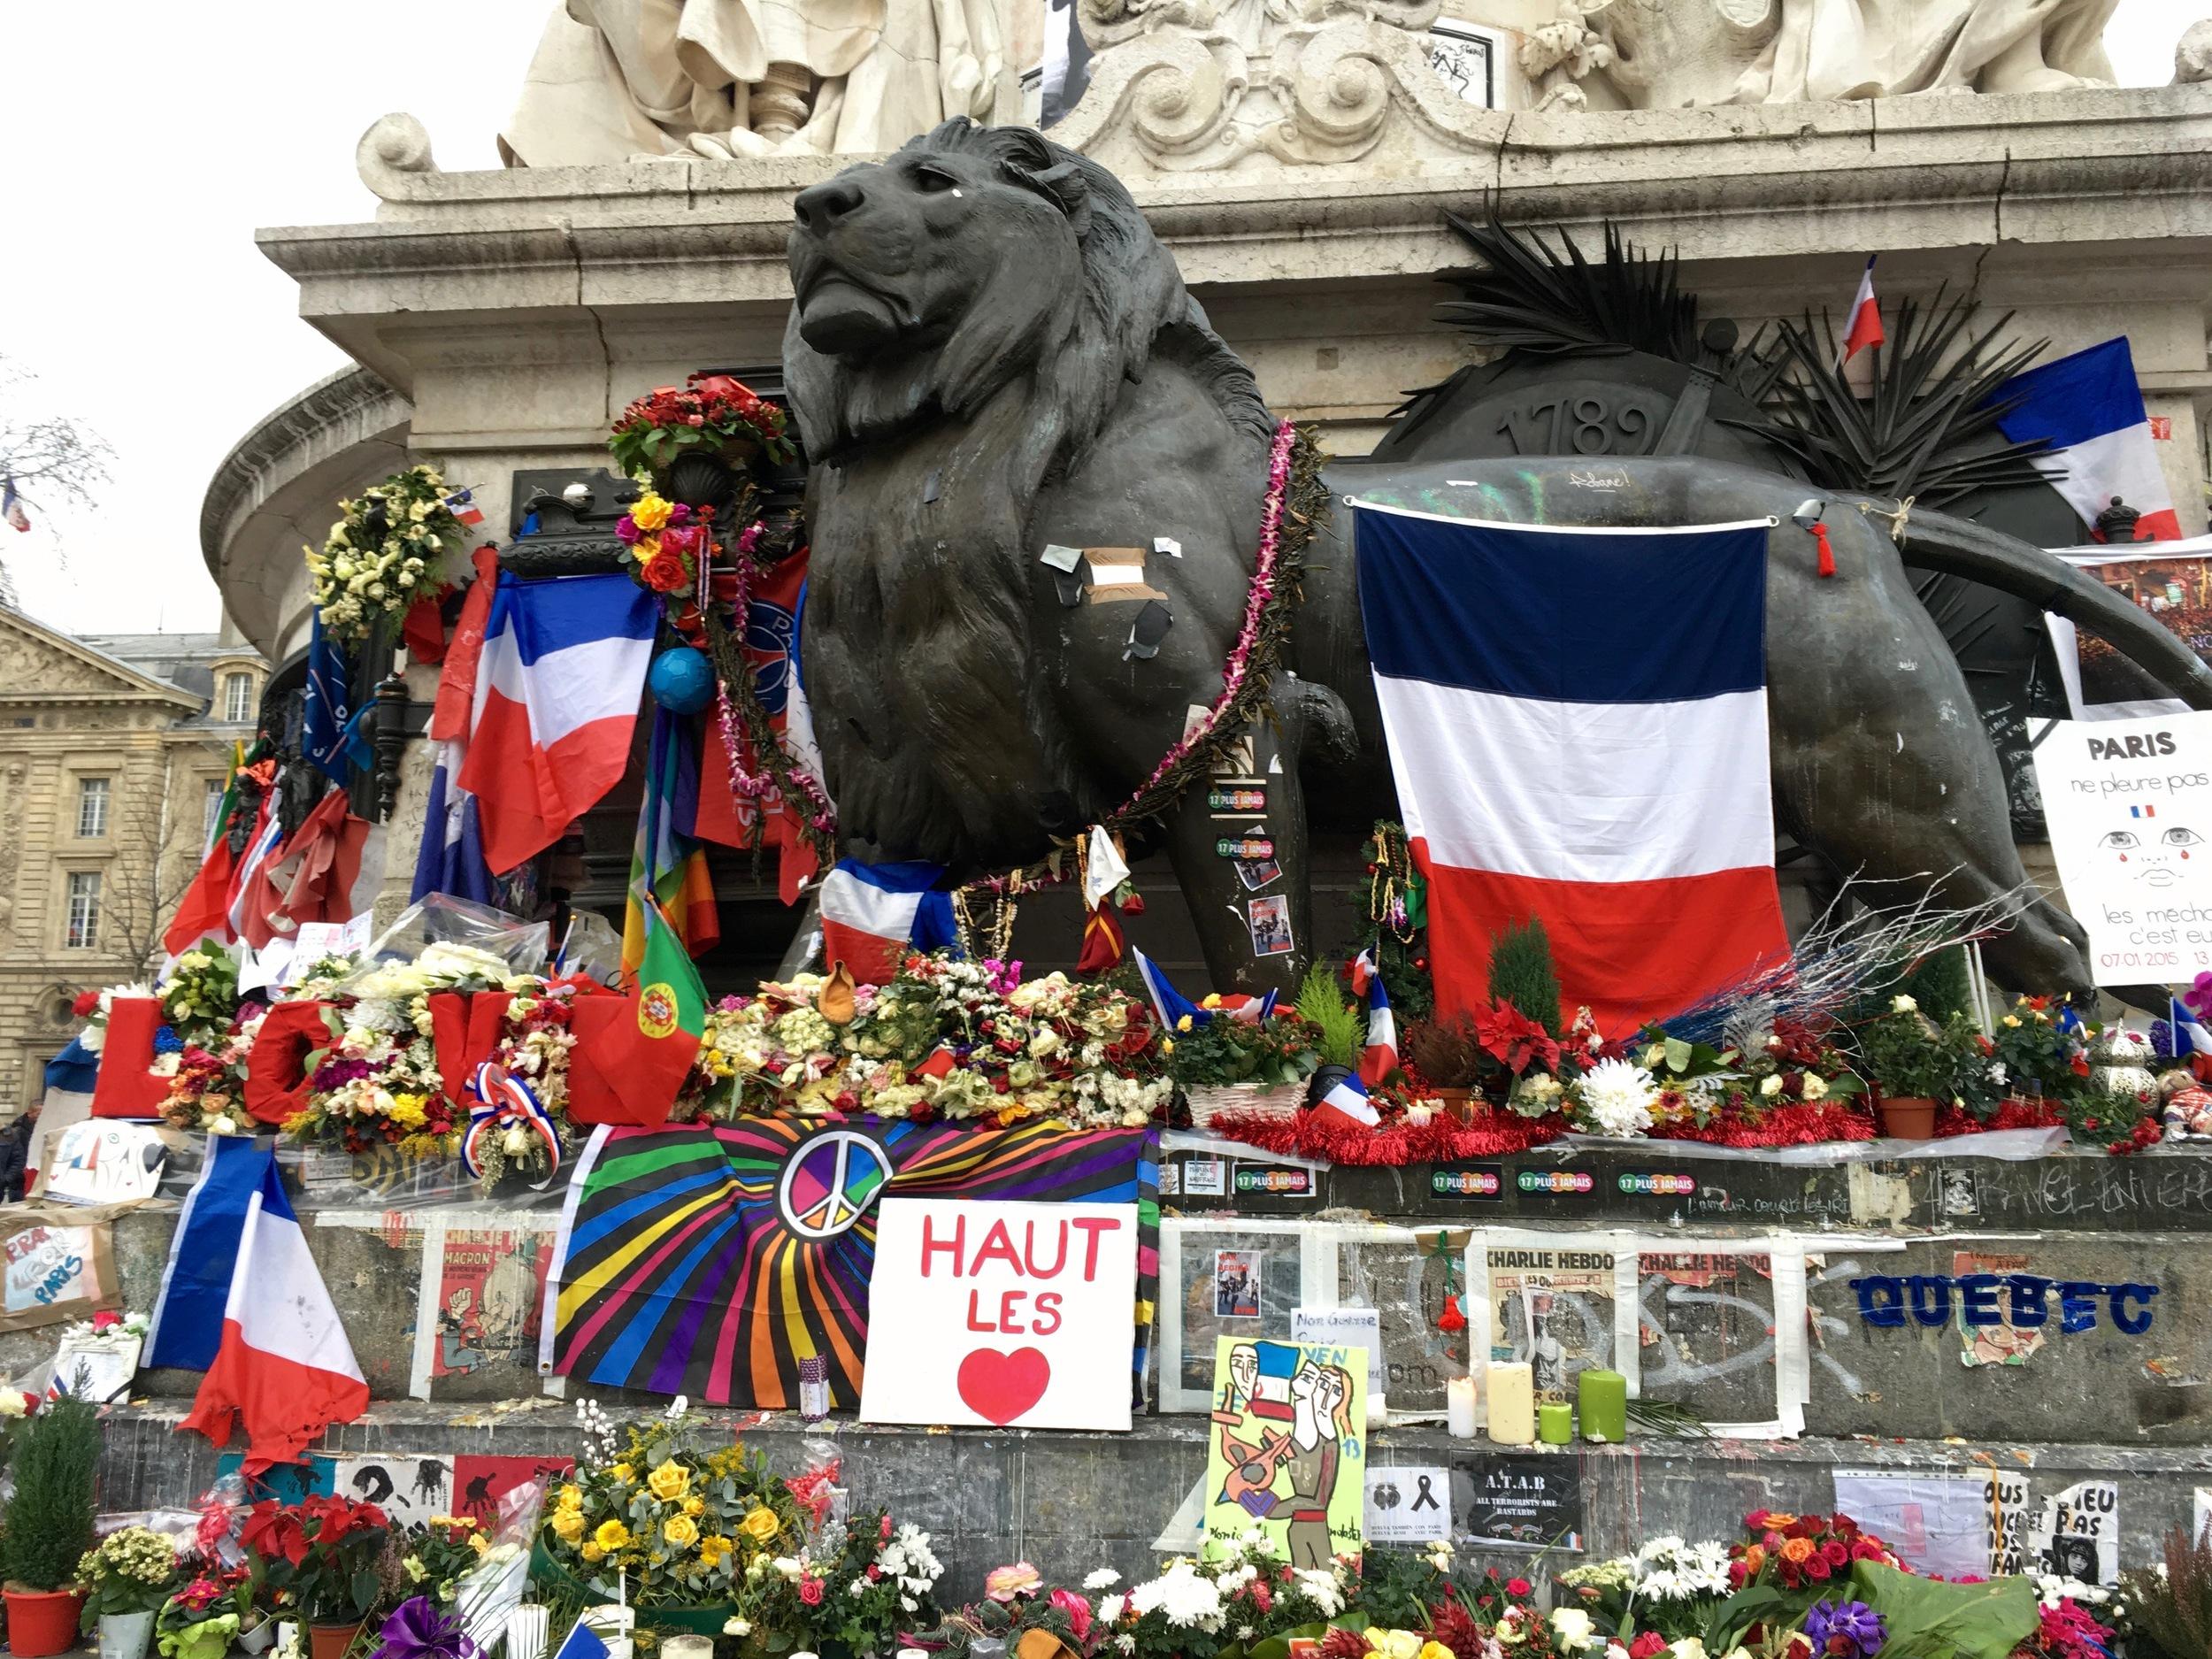 Homage # 2 for the victims of the Paris attacks at Place de la Republic